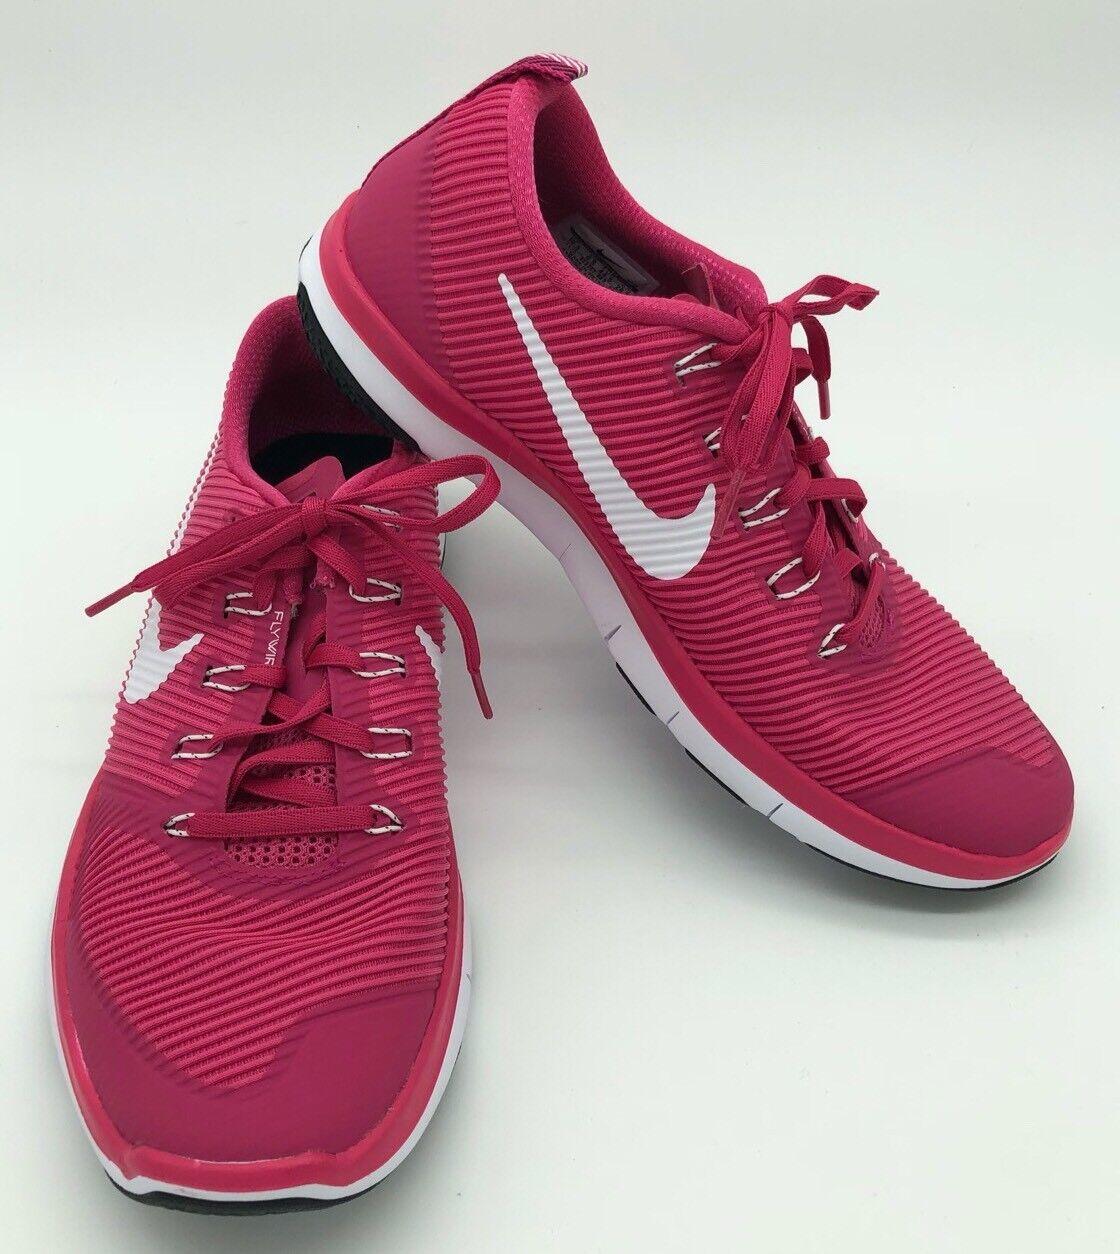 NEW Mens Size 10.5 / Womens Size 12 Nike Free Train Versatility Hot Pink Shoe